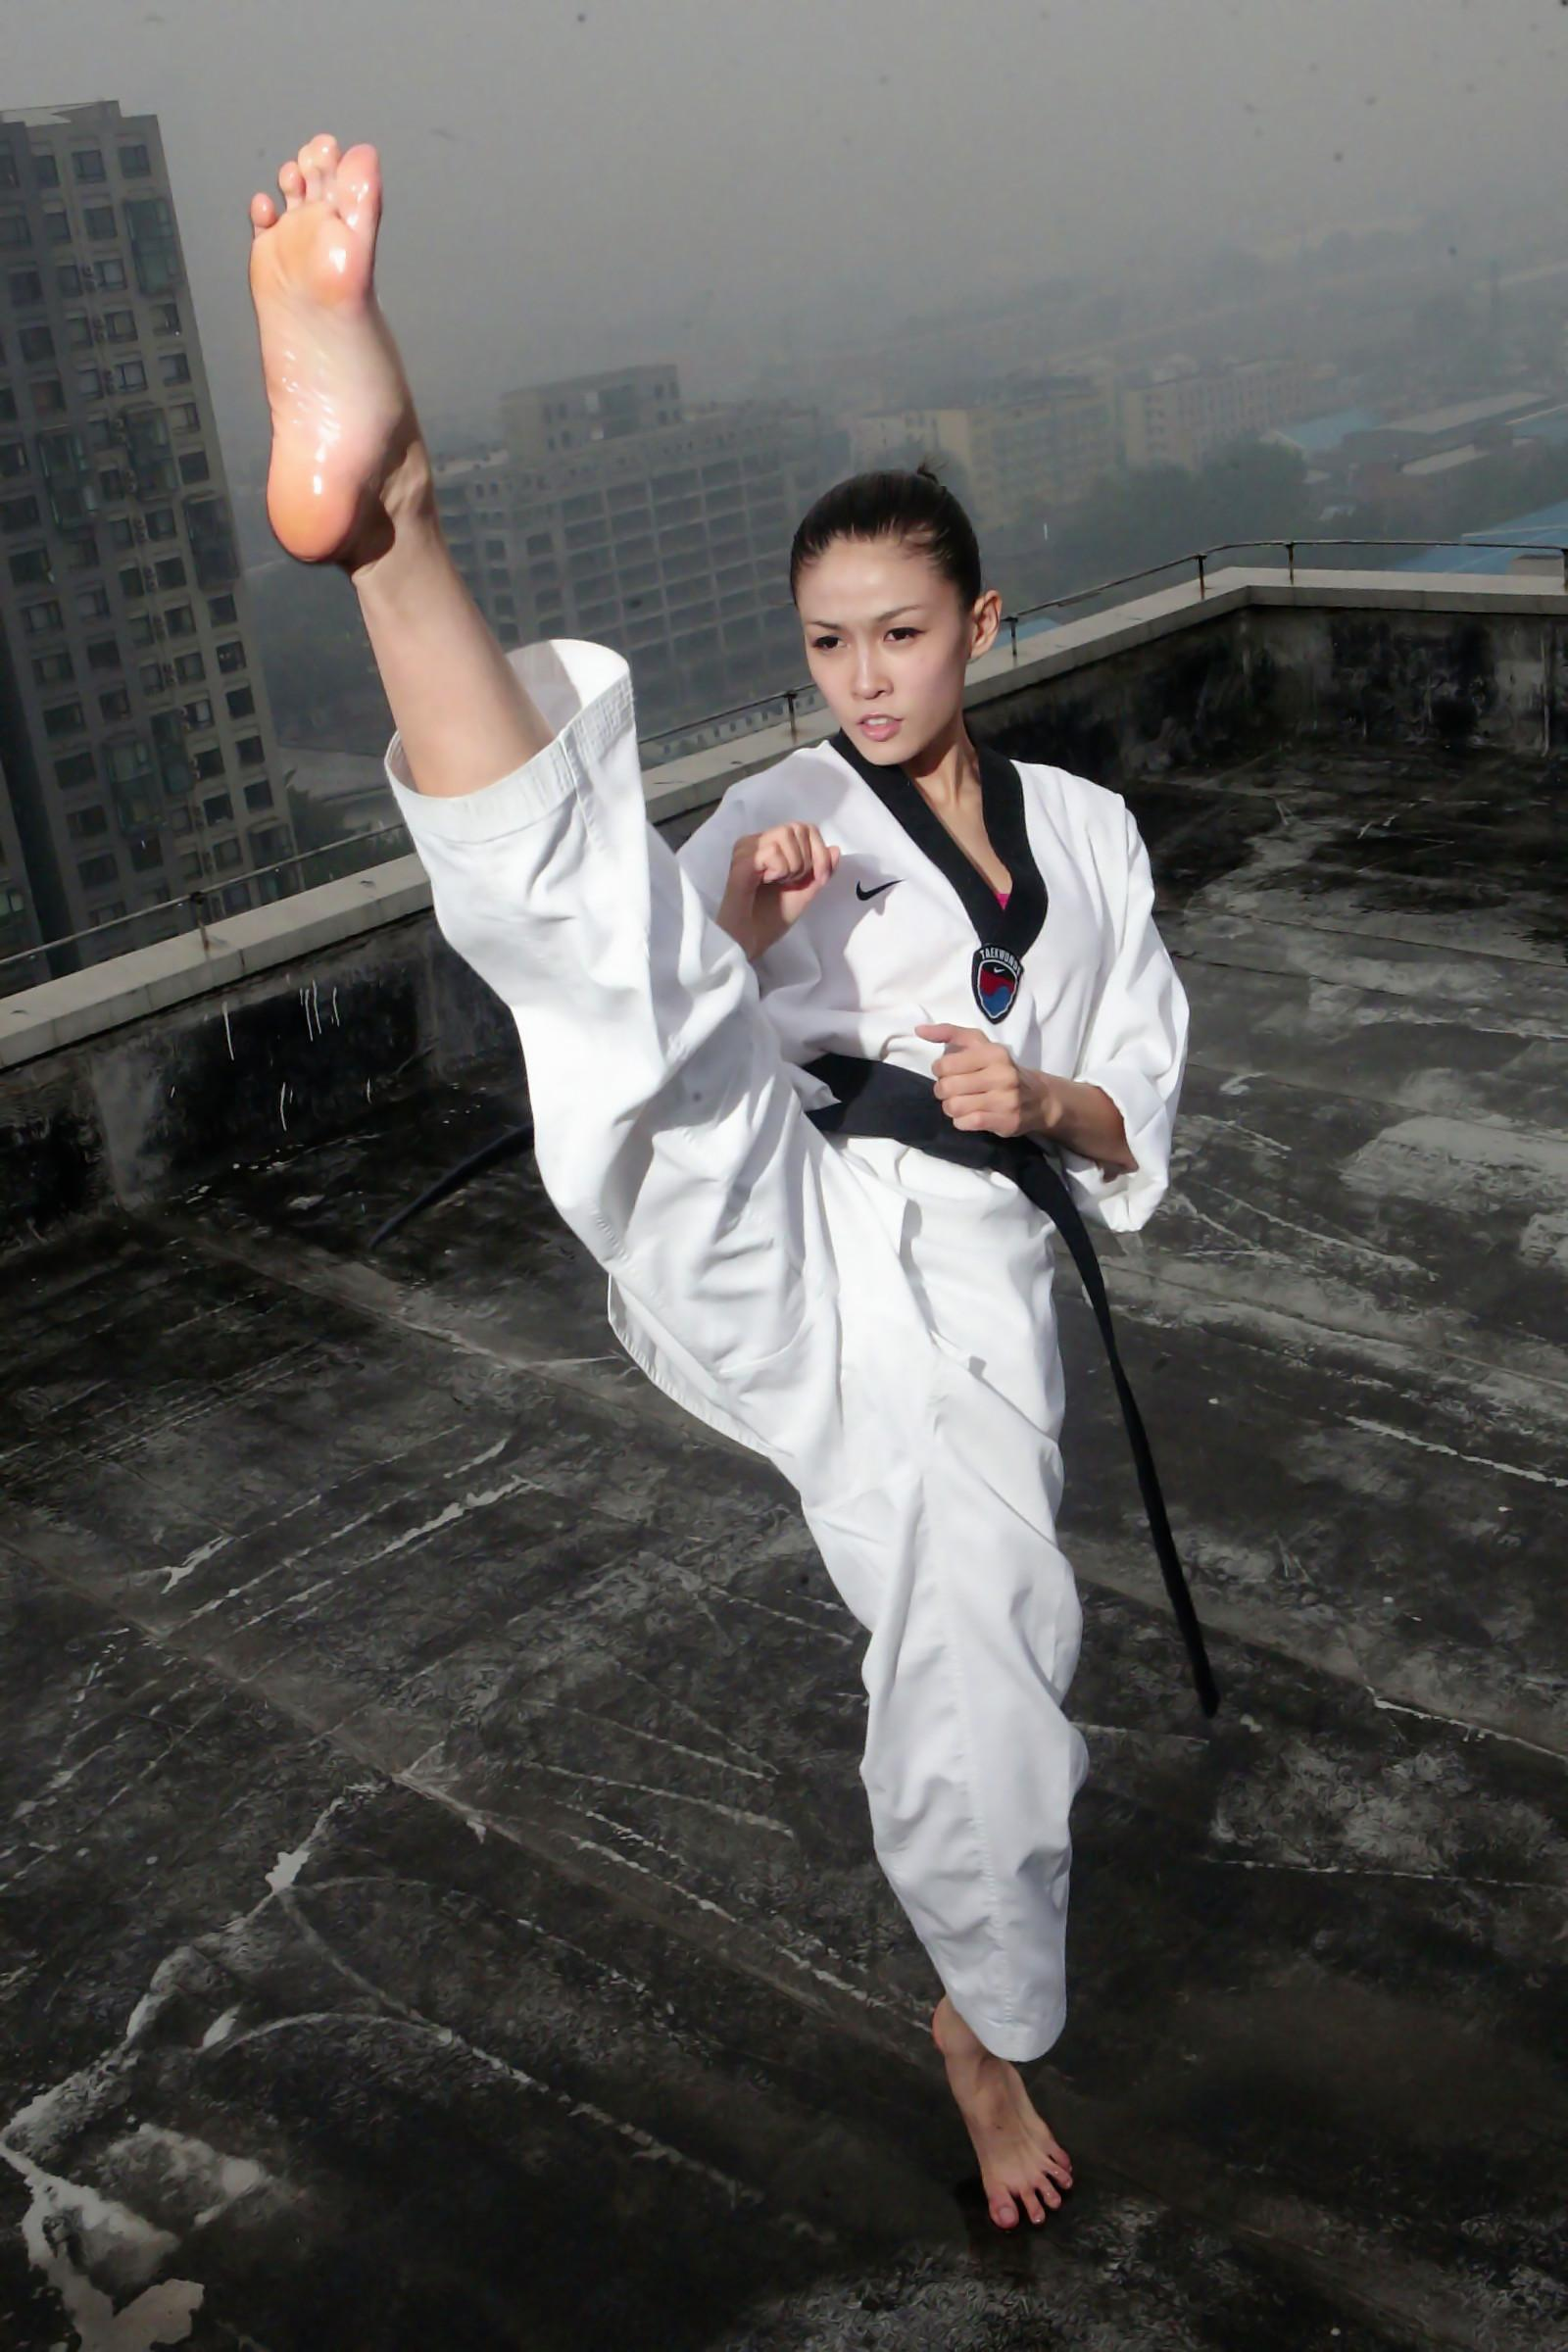 zhang lanxin - photo #1